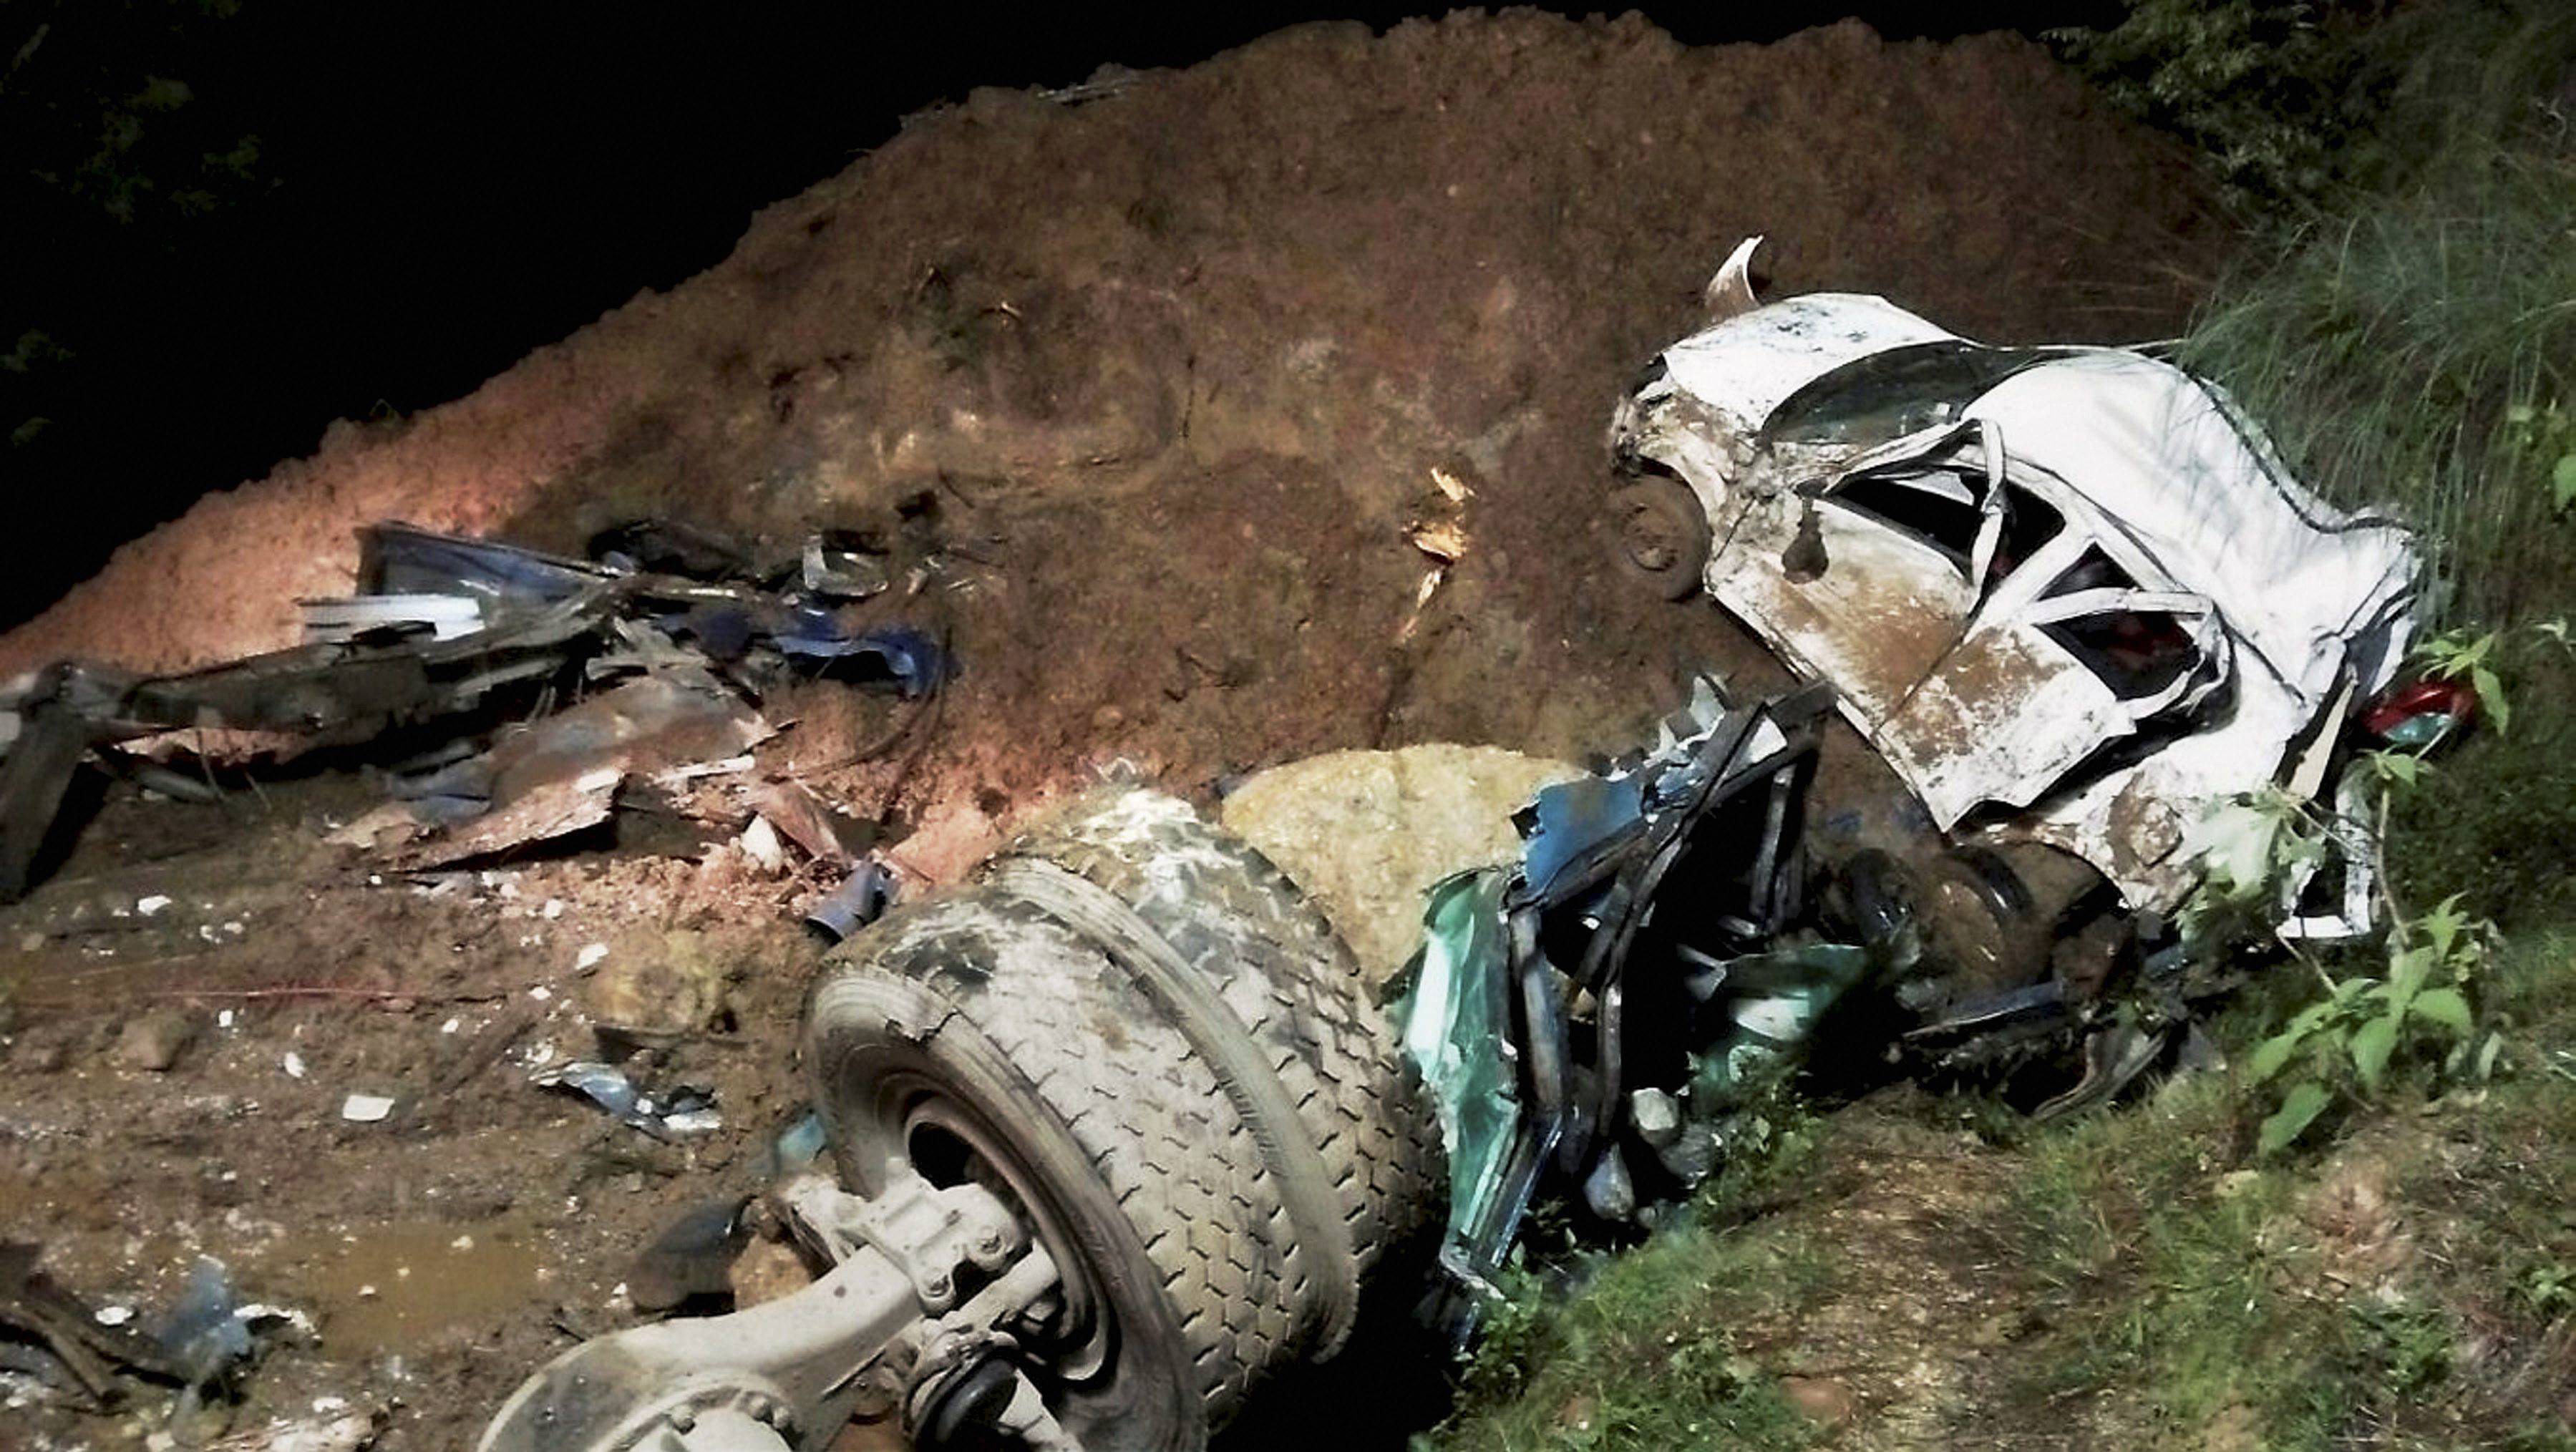 At least 46 dead in landslide in northern Indian state of Himachal Pradesh